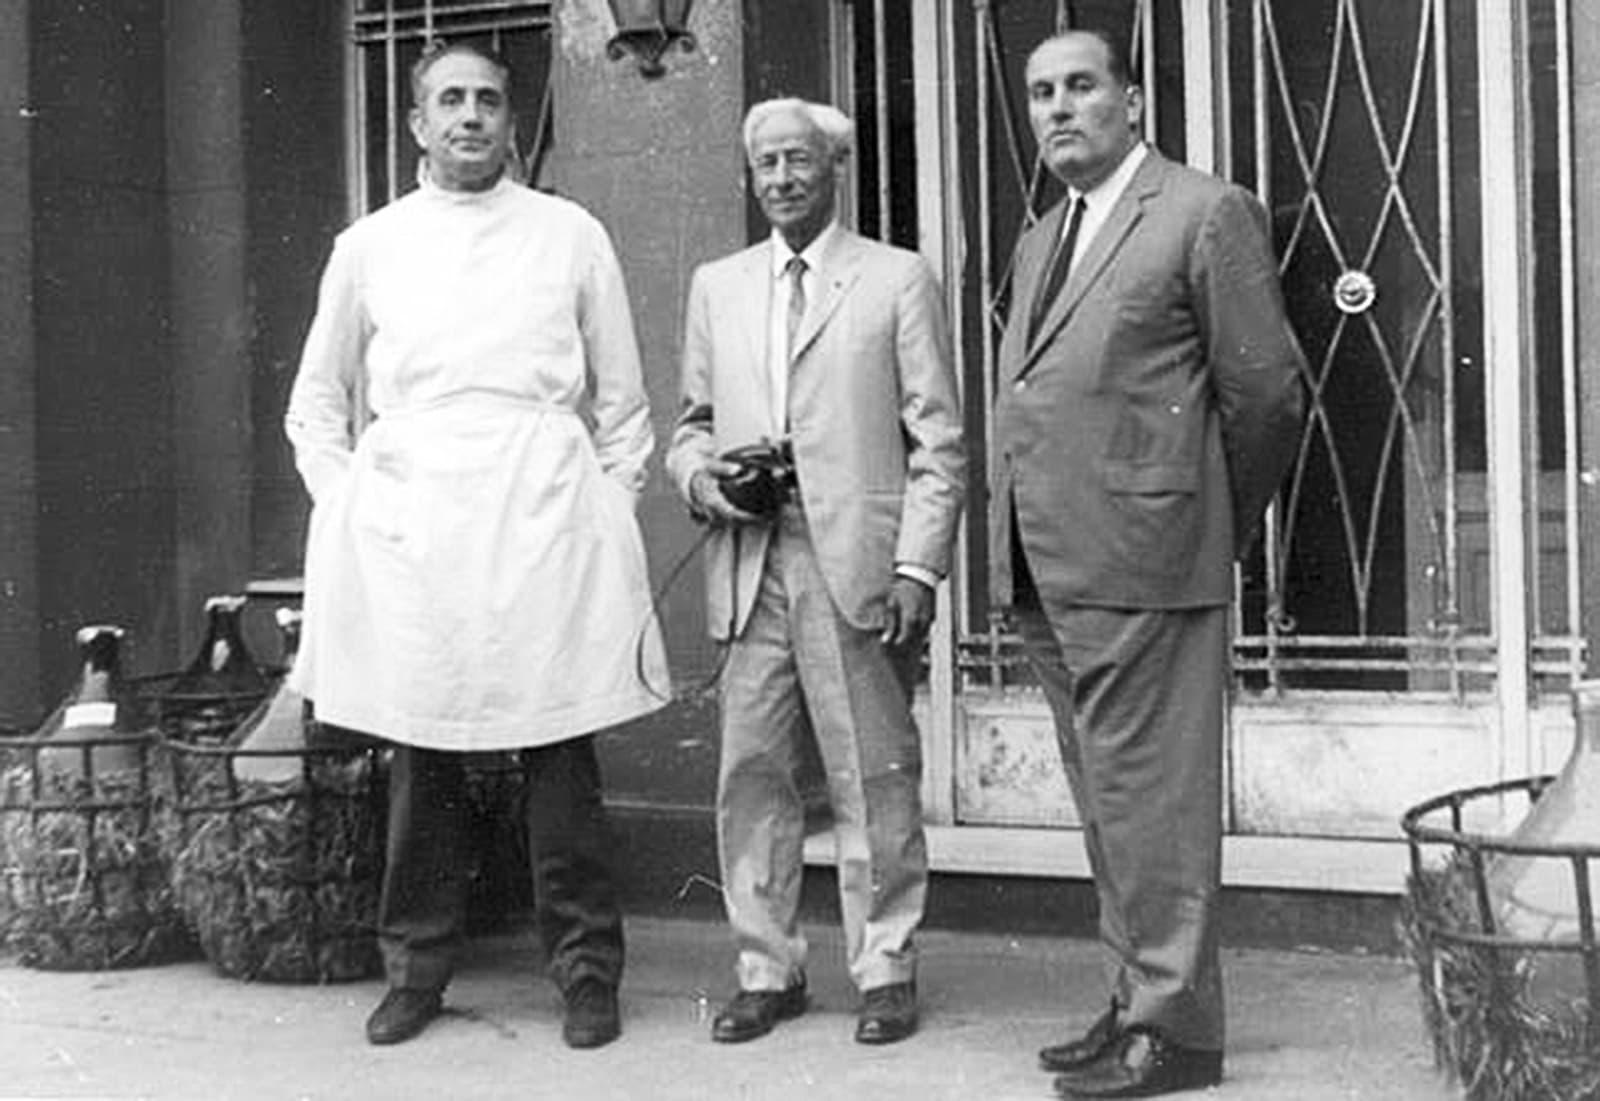 El doctor Alexander Fleming, al centre, visita l'hospital el 1948.